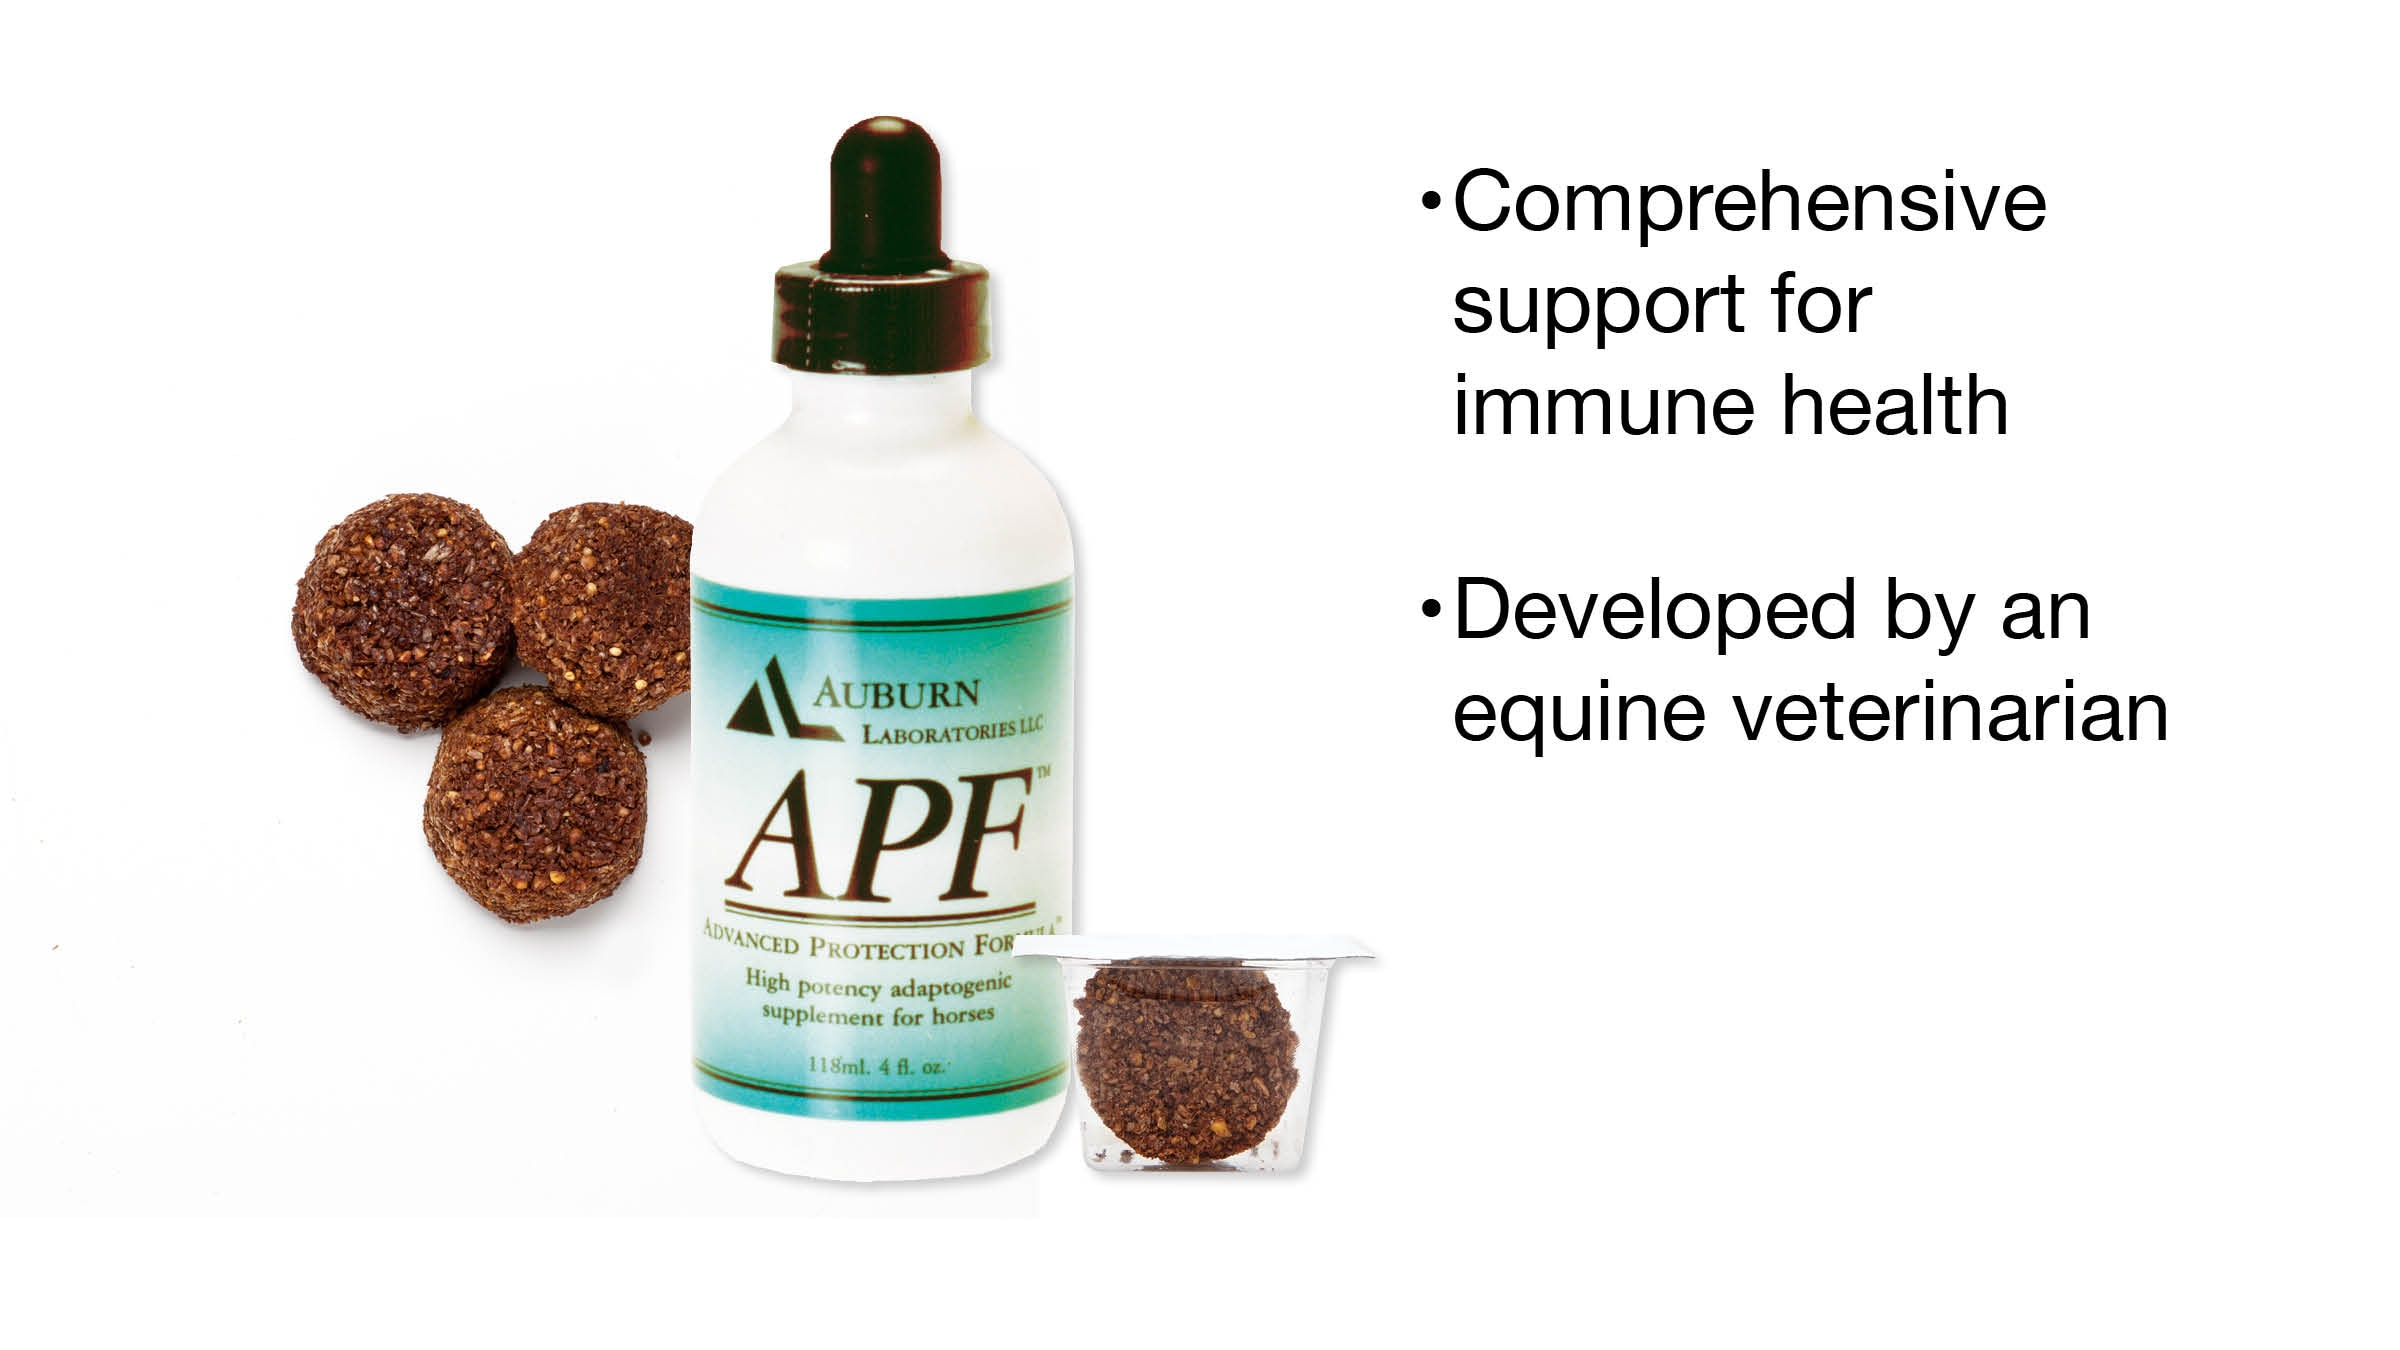 Auburn Laboratories Apf Pro Equine Livestock Supplies 120 Ml Bottle